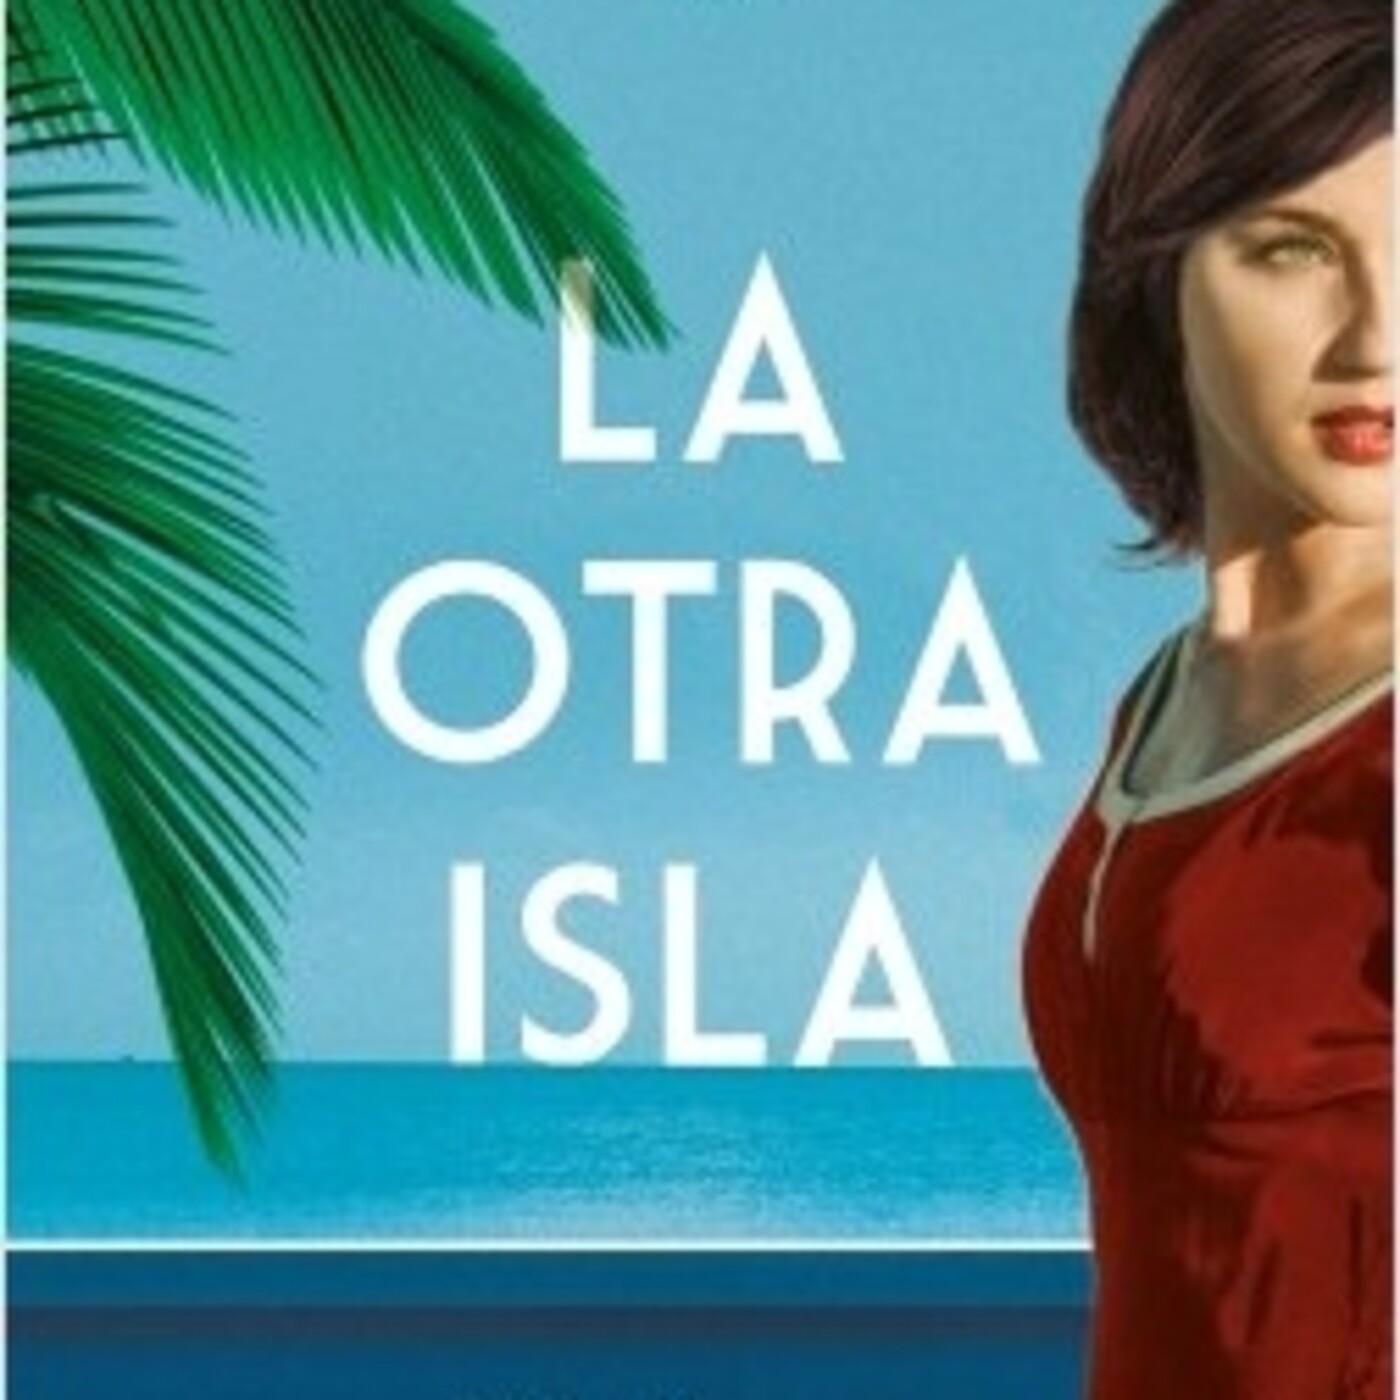 'La otra isla' de Silvia Herreros de Tejada